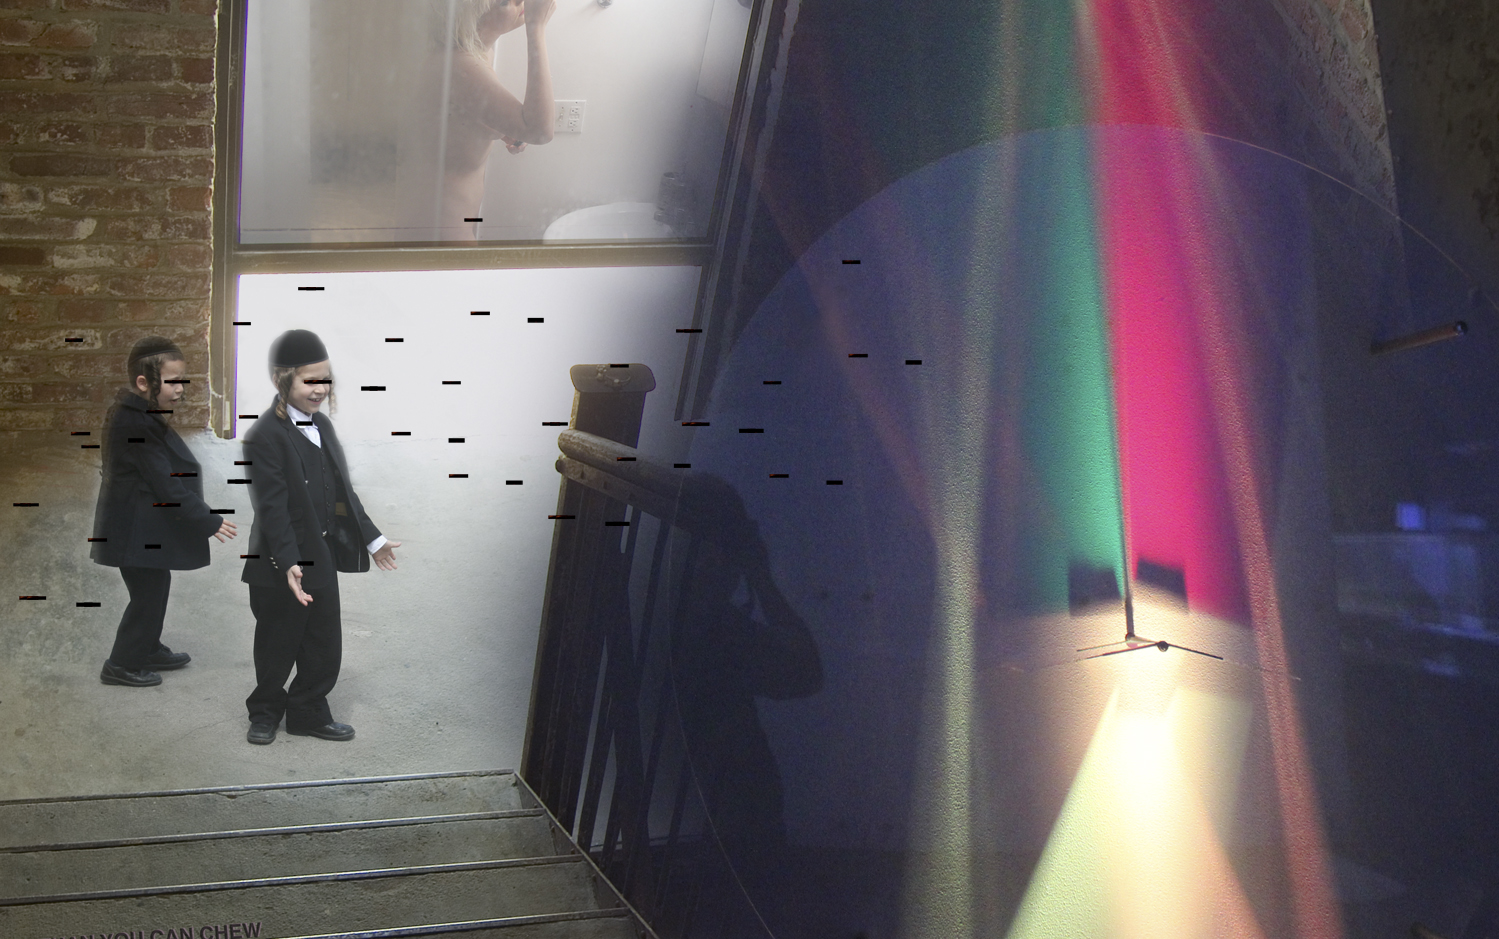 DSCF3843_Horizontal stairs_flat_SAFE Kids cropLowres.jpg